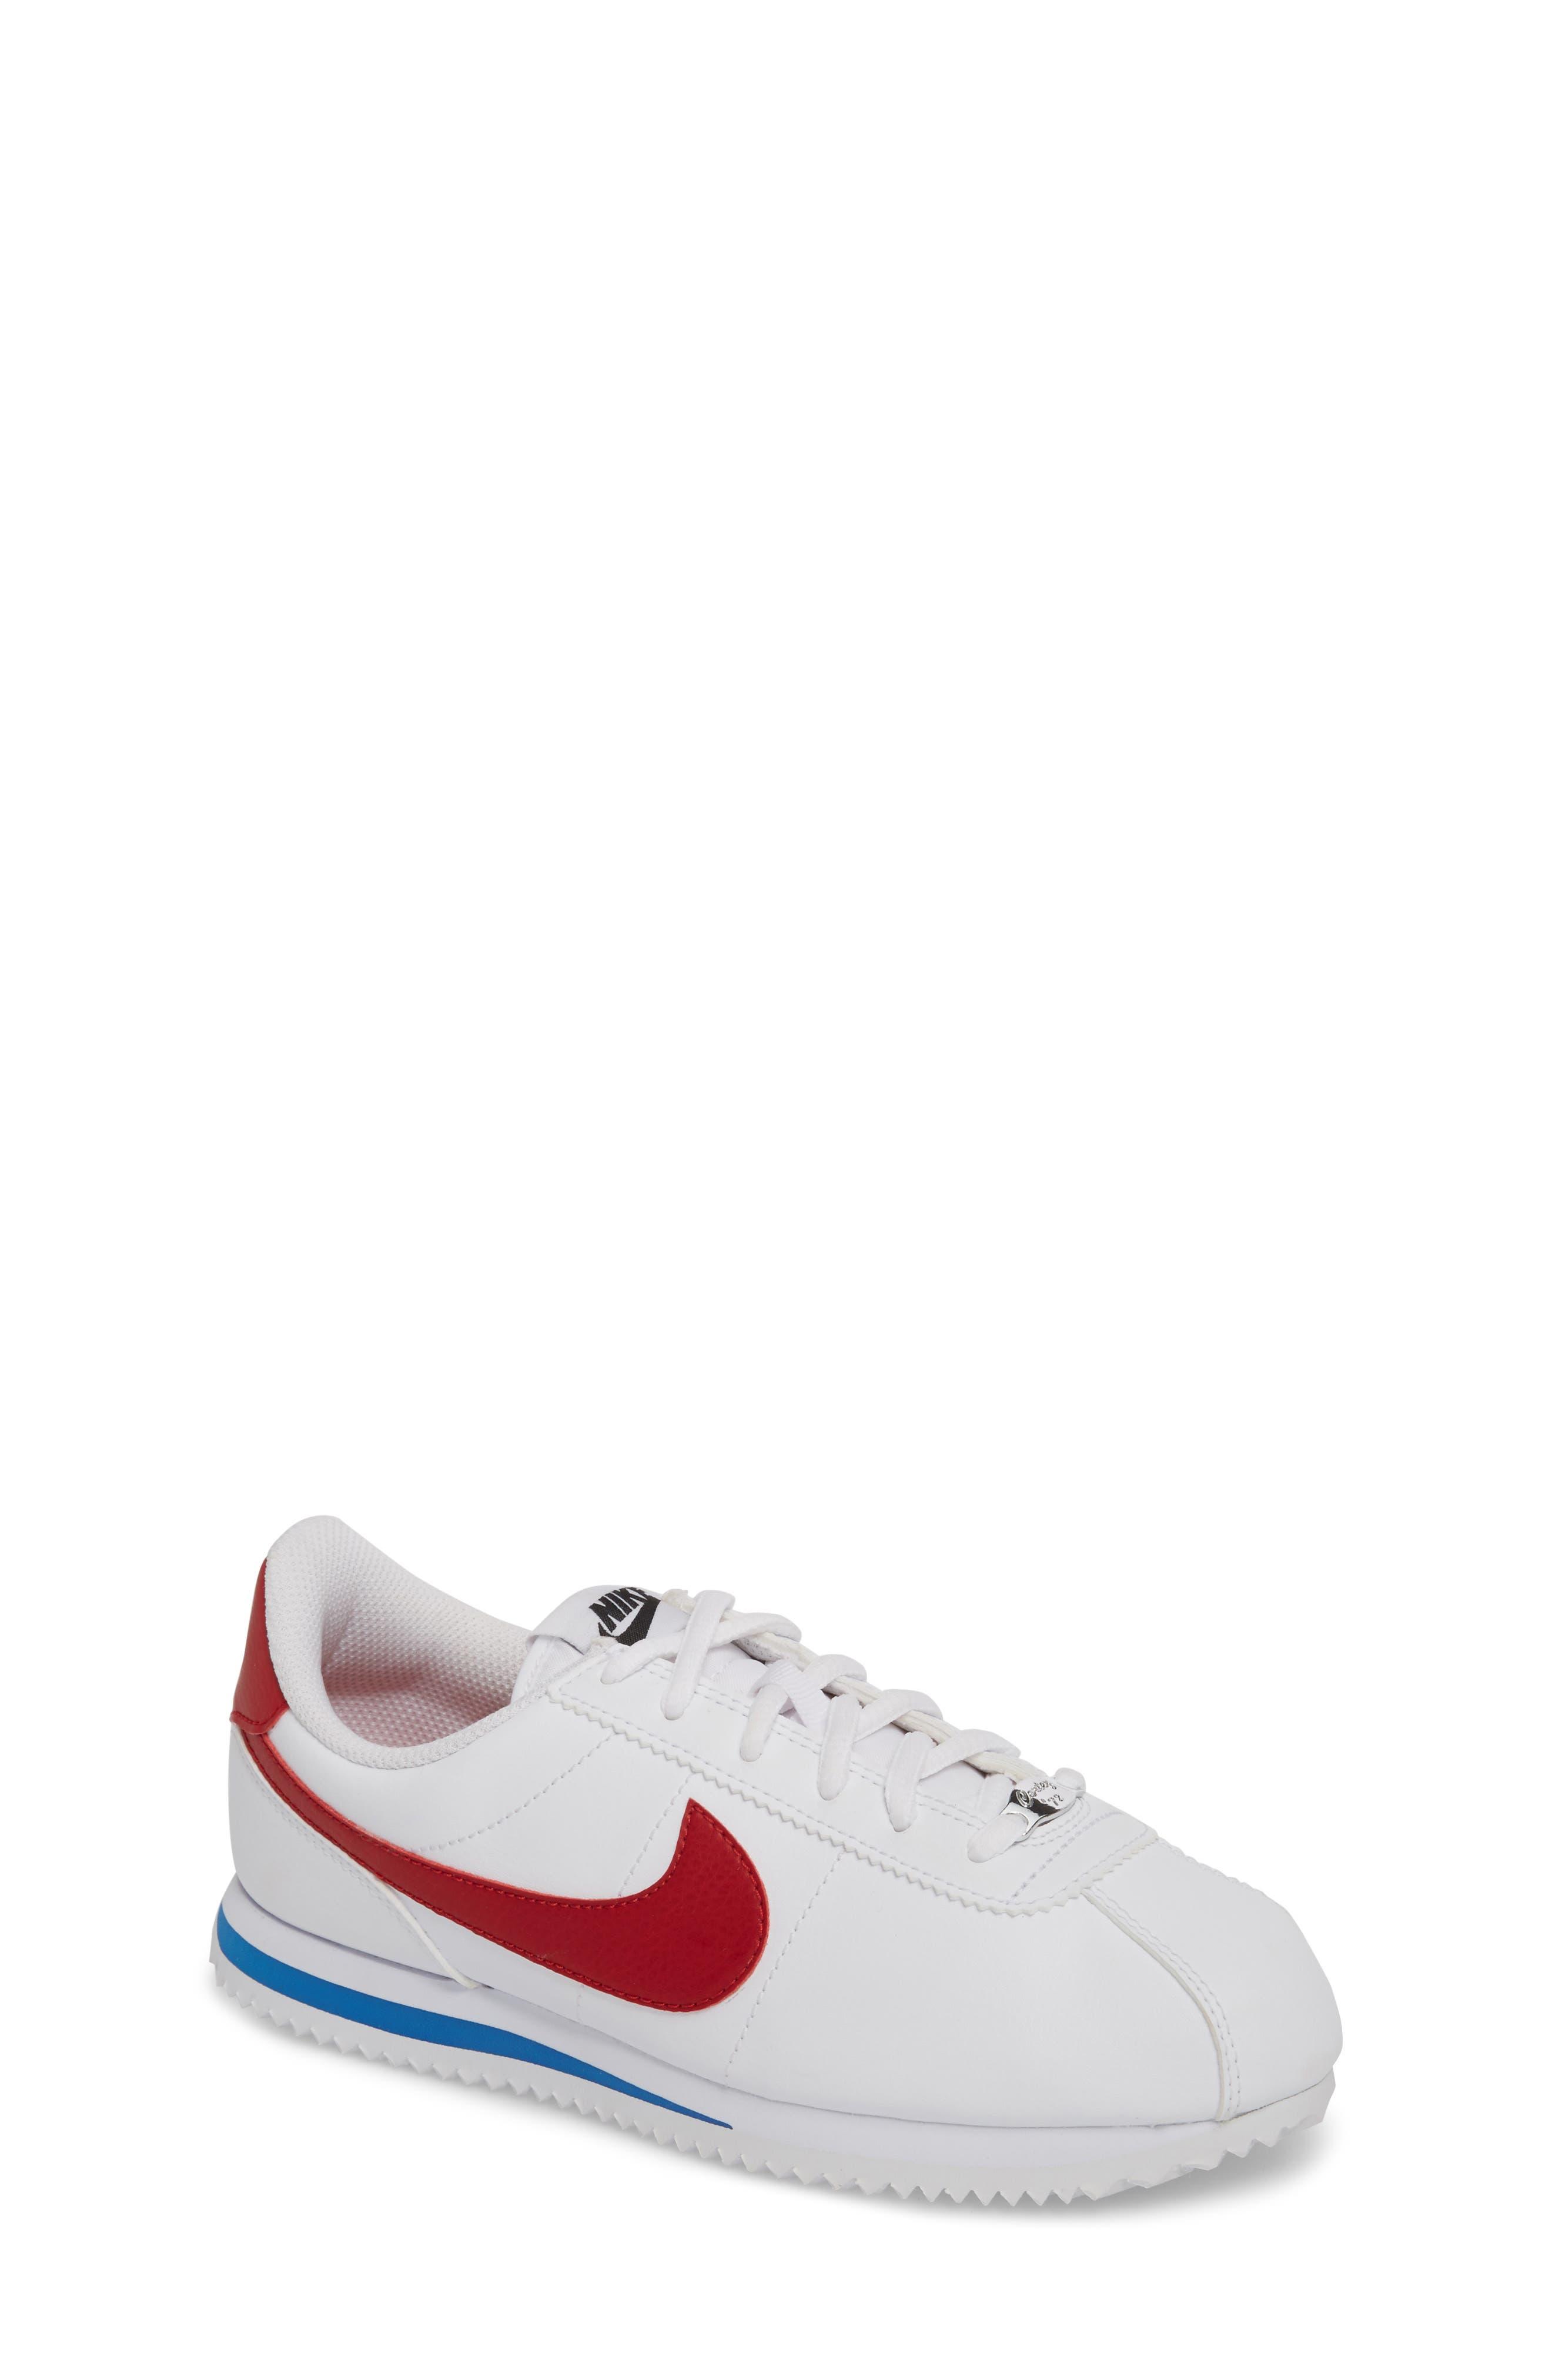 Cortez Basic SL Sneaker,                         Main,                         color, WHITE/ VARSITY RED-ROYAL-BLACK